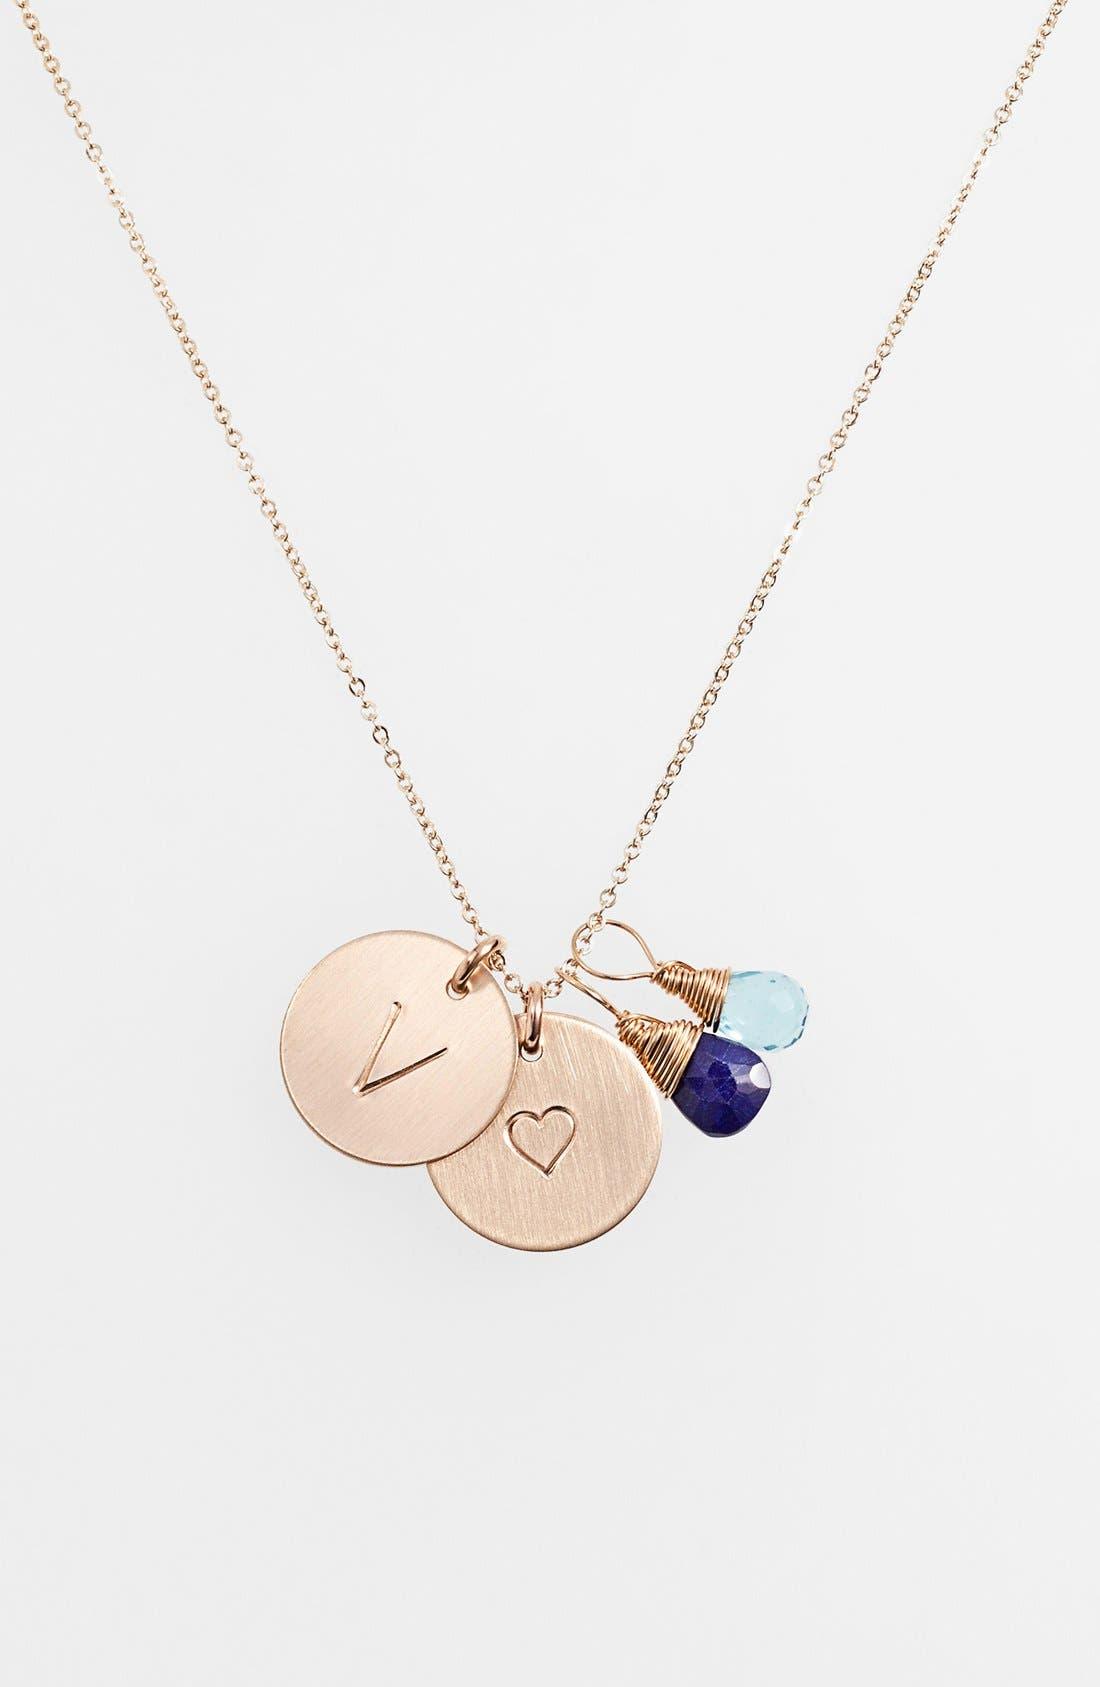 Main Image - Nashelle Blue Quartz Initial & Heart 14k-Gold Fill Disc Necklace